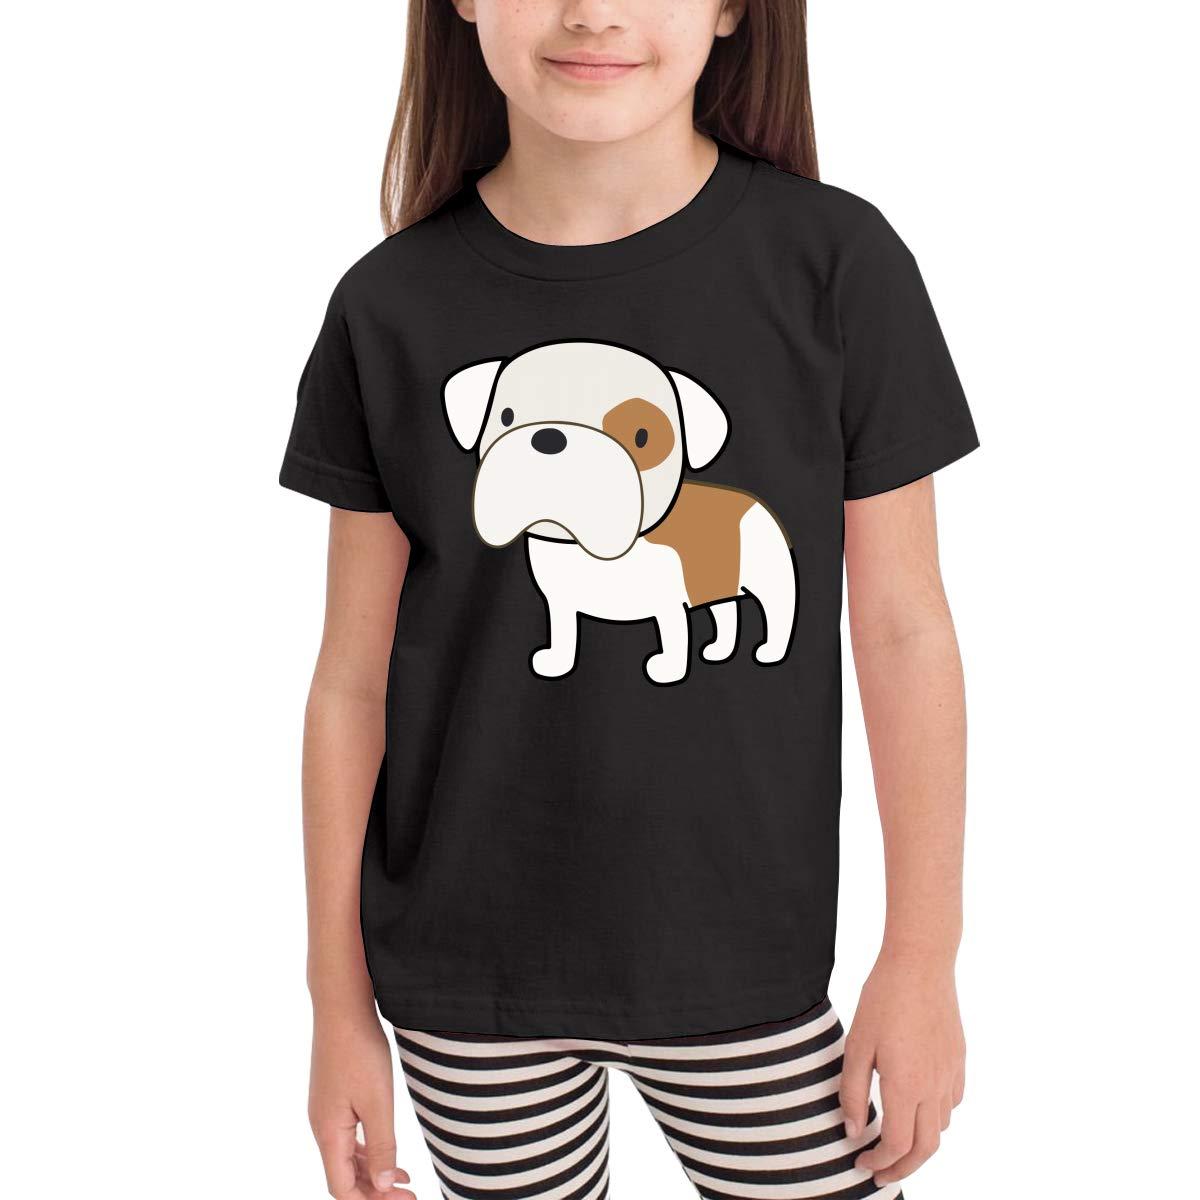 Bam Bam English Bulldog Kids Cotton T-Shirt Basic Soft Short Sleeve Tee Tops for Baby Boys Girls